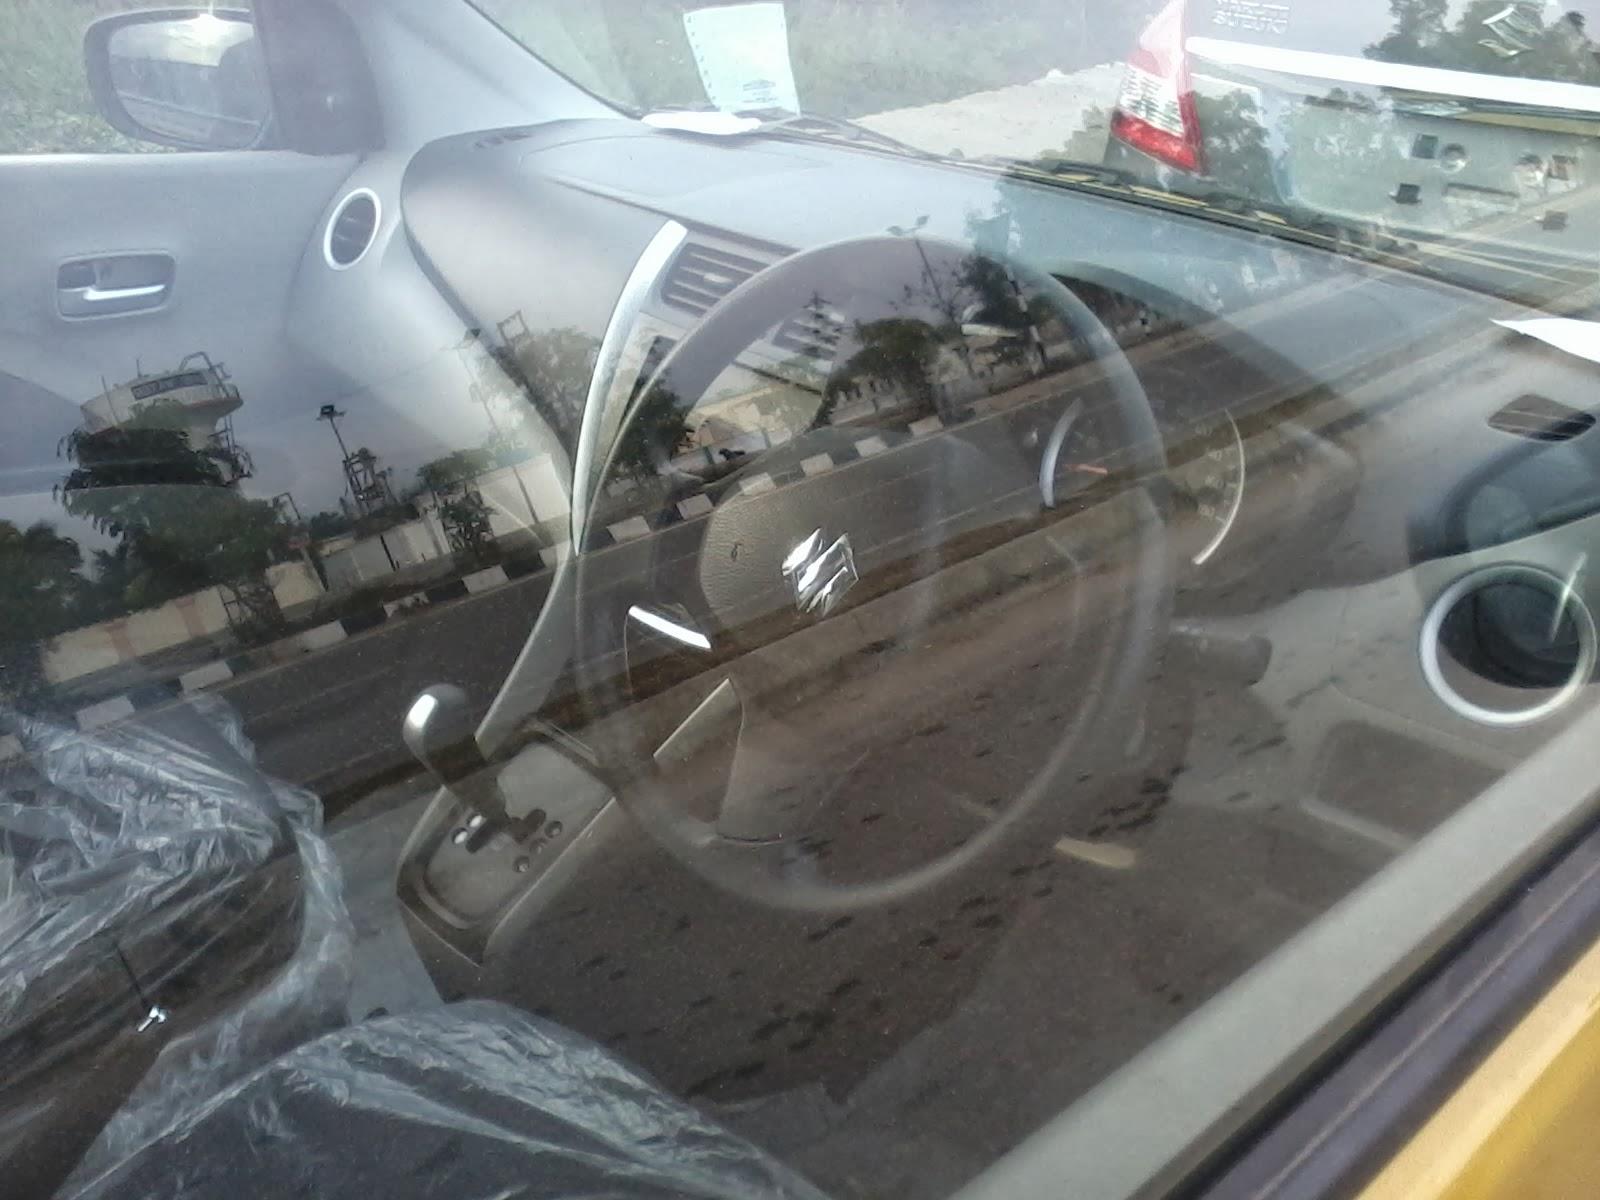 Maruti Celerio Exterior and Interior Pictures - Car and ...